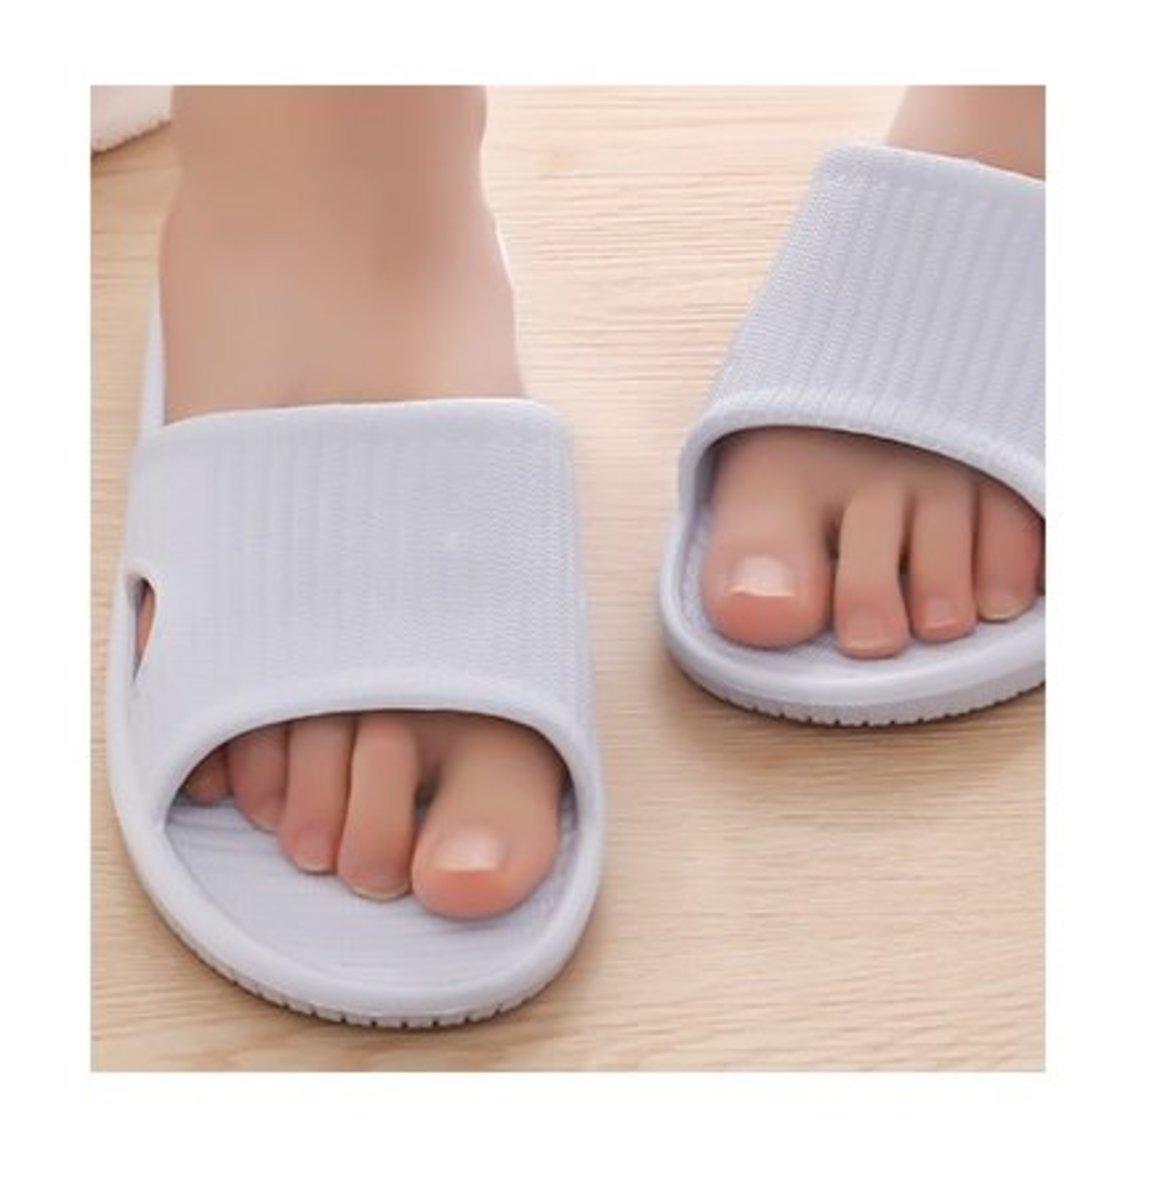 Japan World life ladies home bathroom slippers (light blue / 36-37)